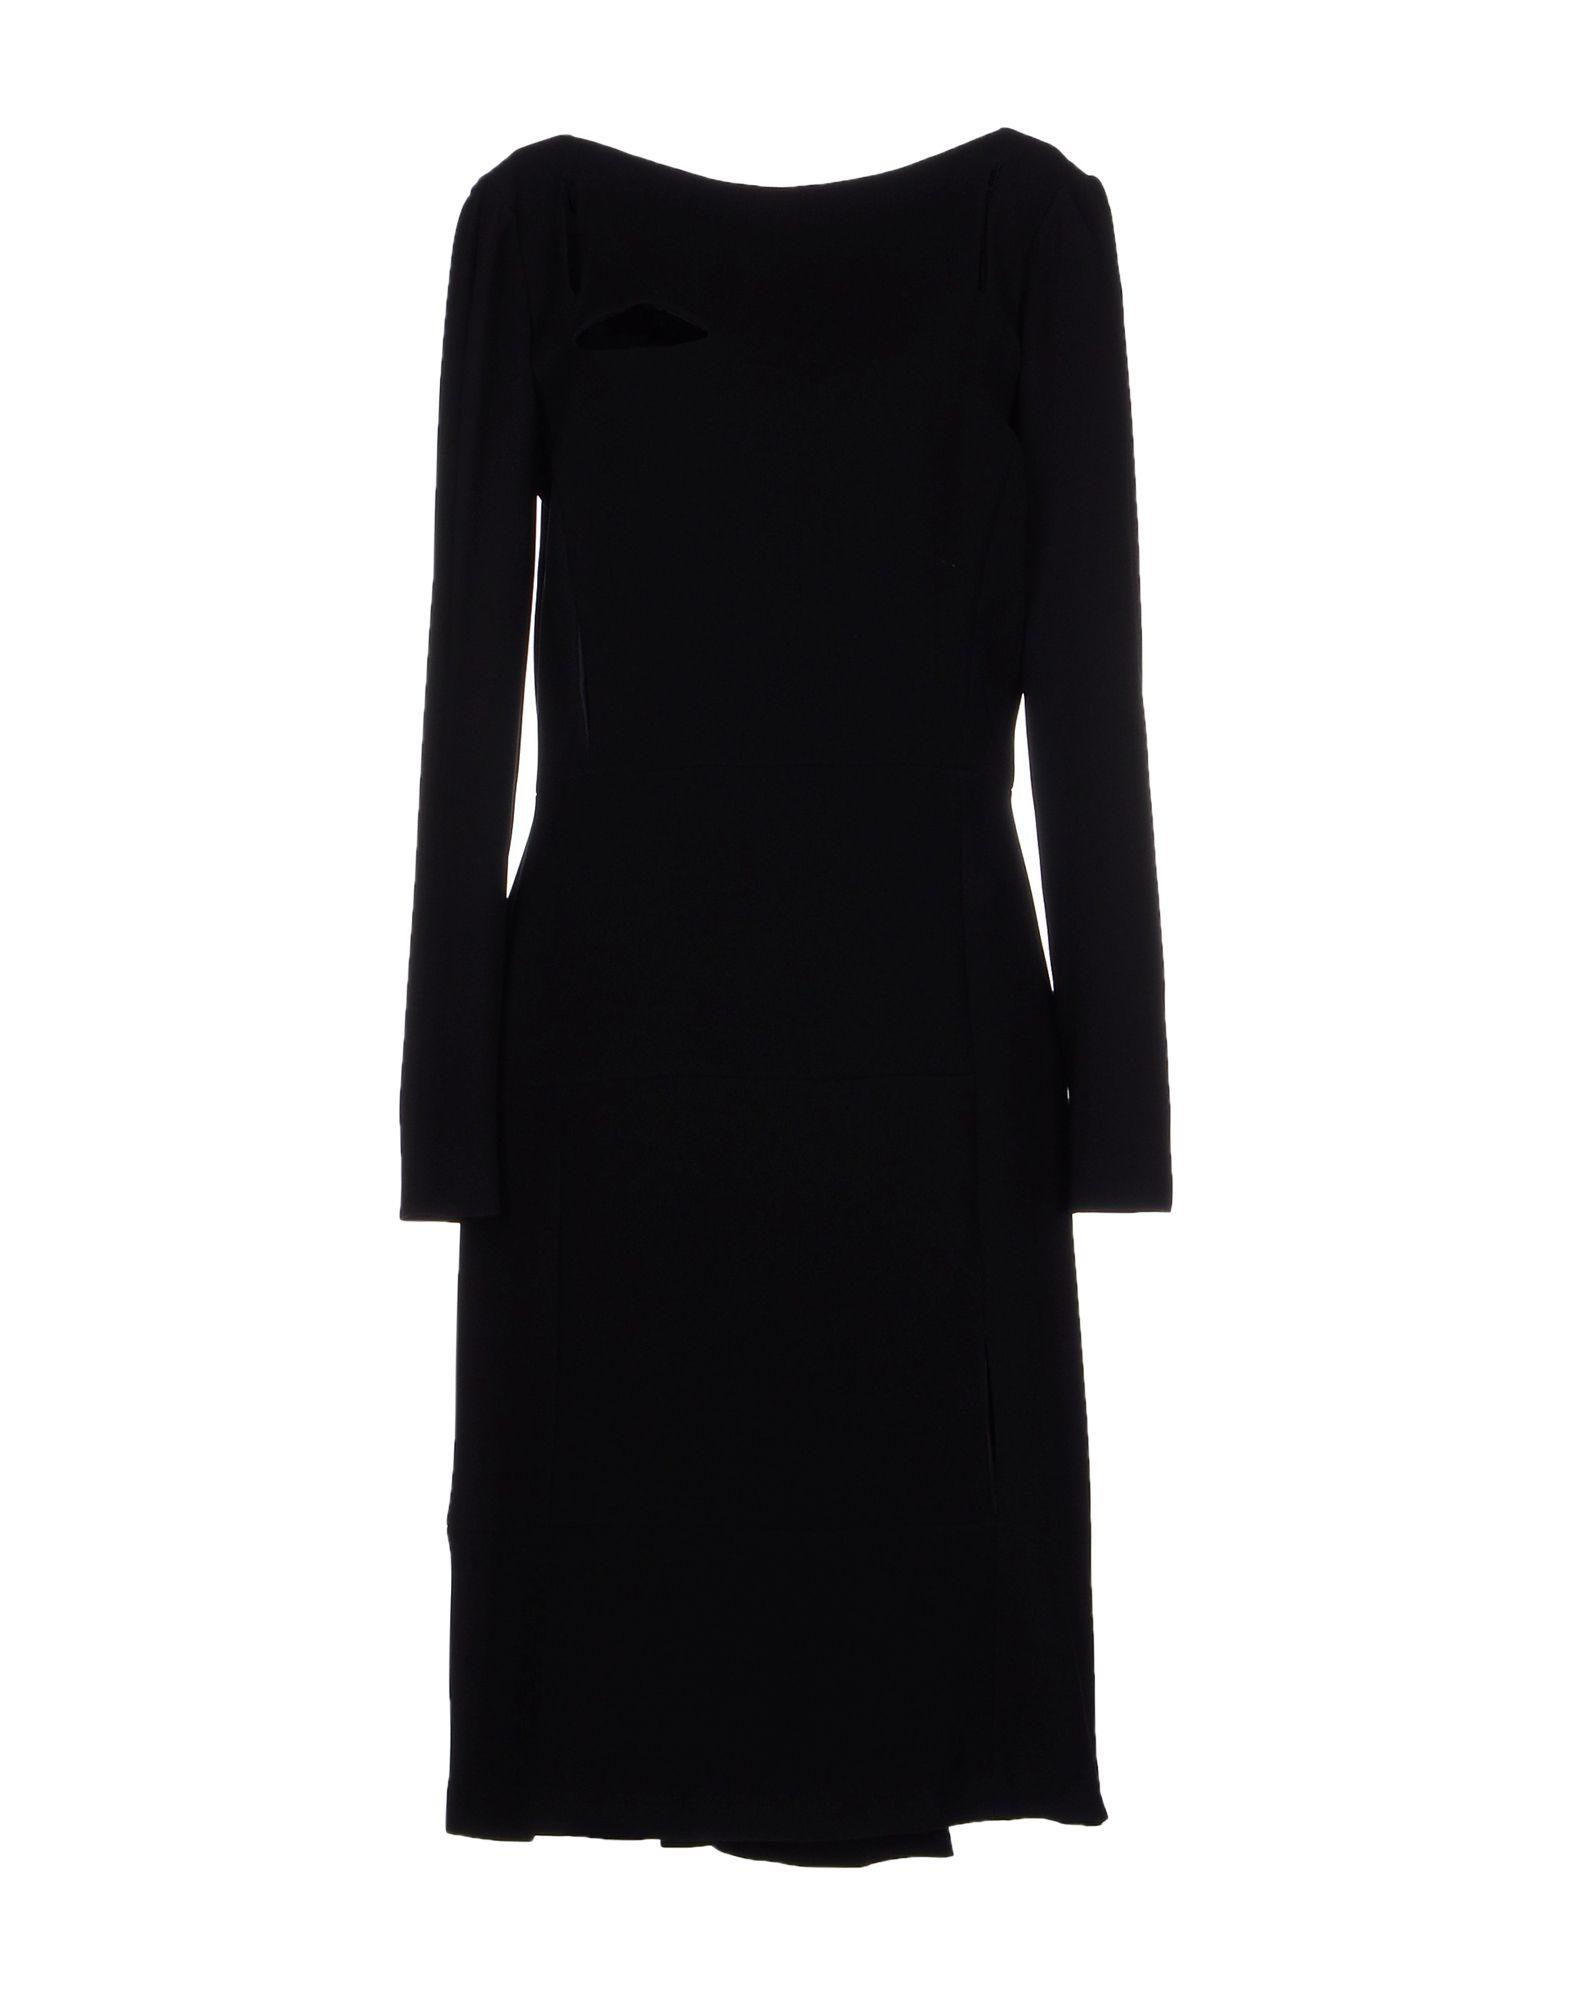 Sonia rykiel Knee-length Dress in Black